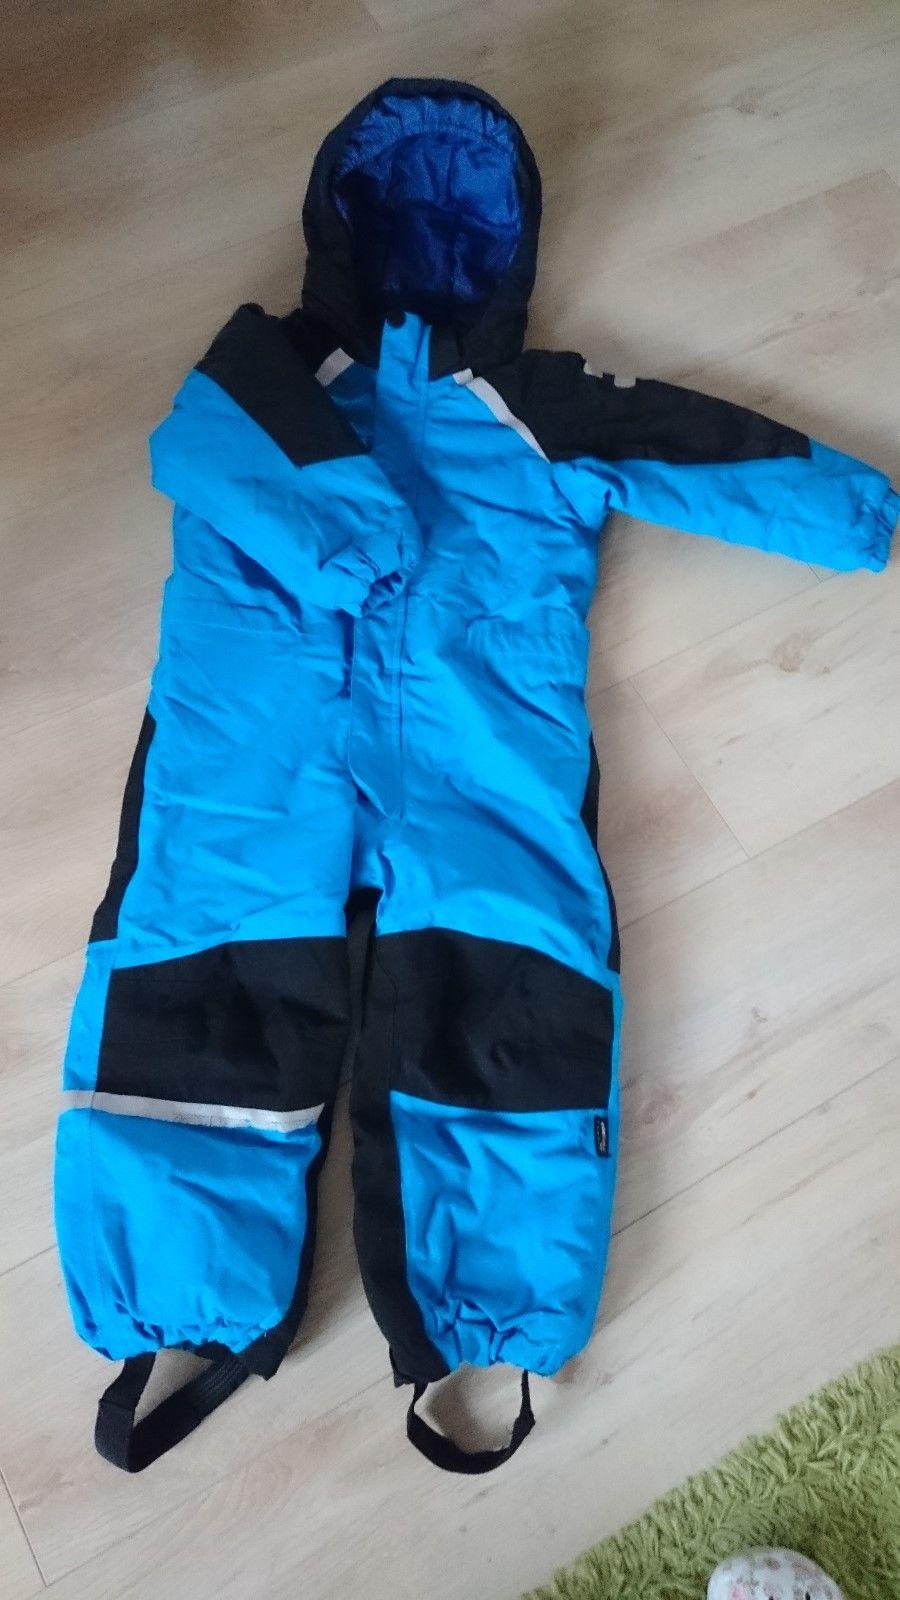 H&M Schneeanzug Jungen Gr. 110, blau